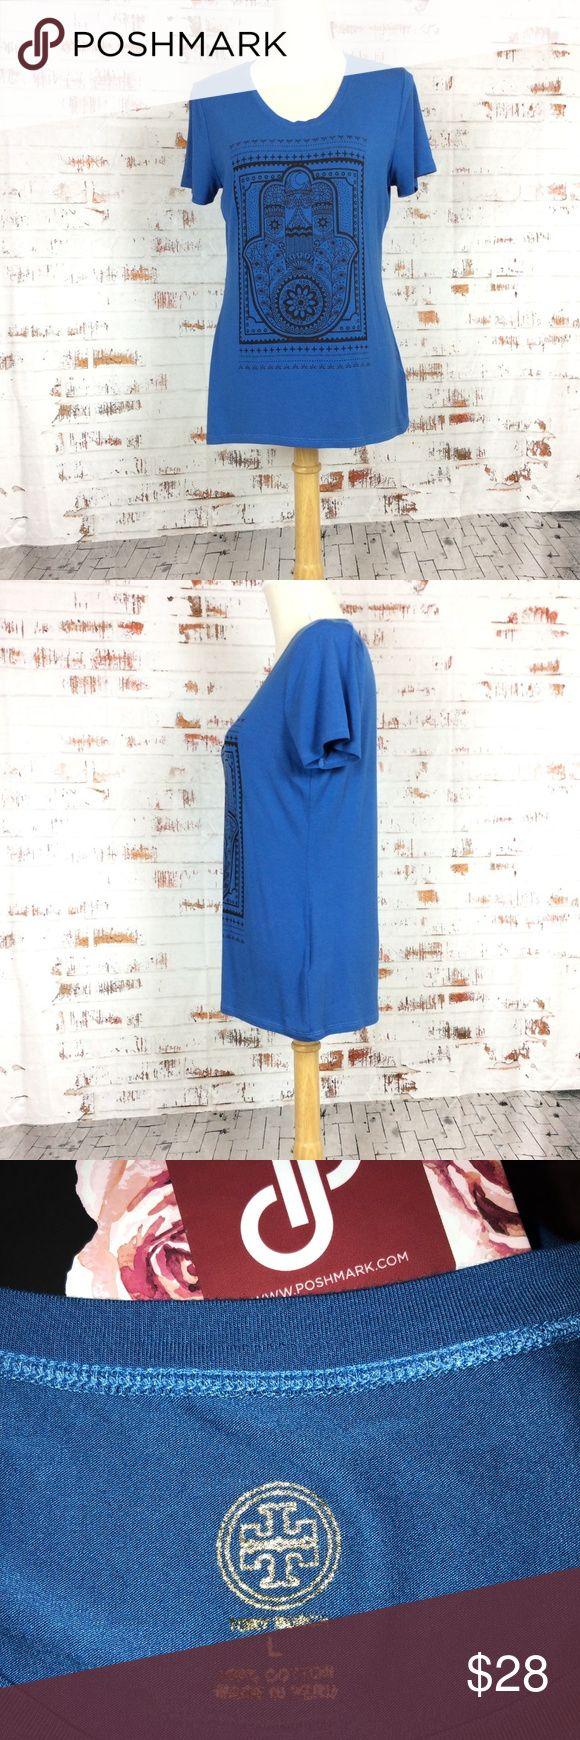 Tory Burch Cobalt Blue Hamas Hand T Tory Burch Hamas Hand T shirt in stunning cobalt blue. Size large, soft stretchy cotton/poly blend fabric. Tory Burch Tops Tees - Short Sleeve